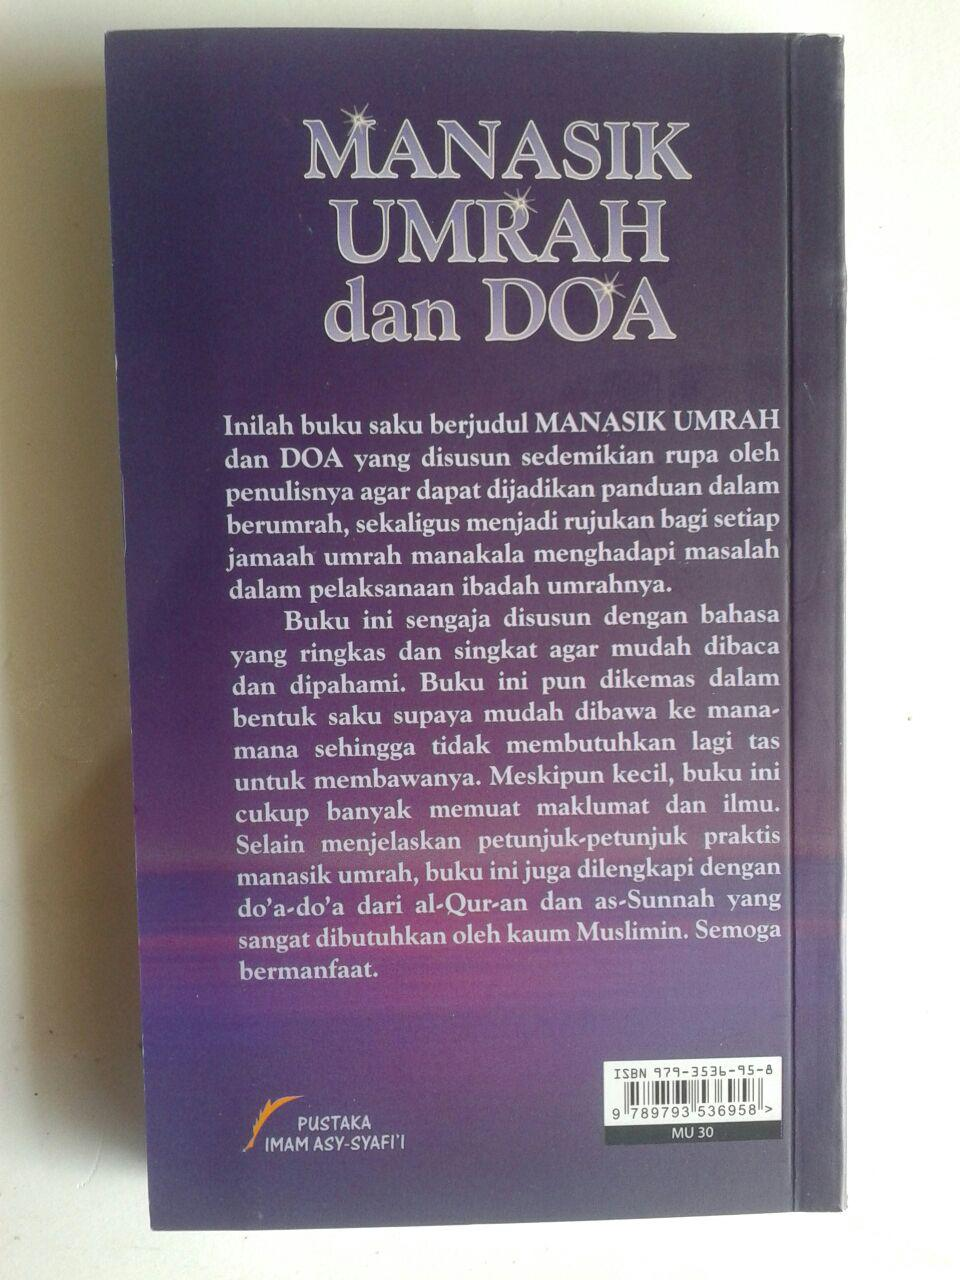 Buku Manasik Umrah Dan Doa Menurut Al-Quran Dan As-Sunnah cover